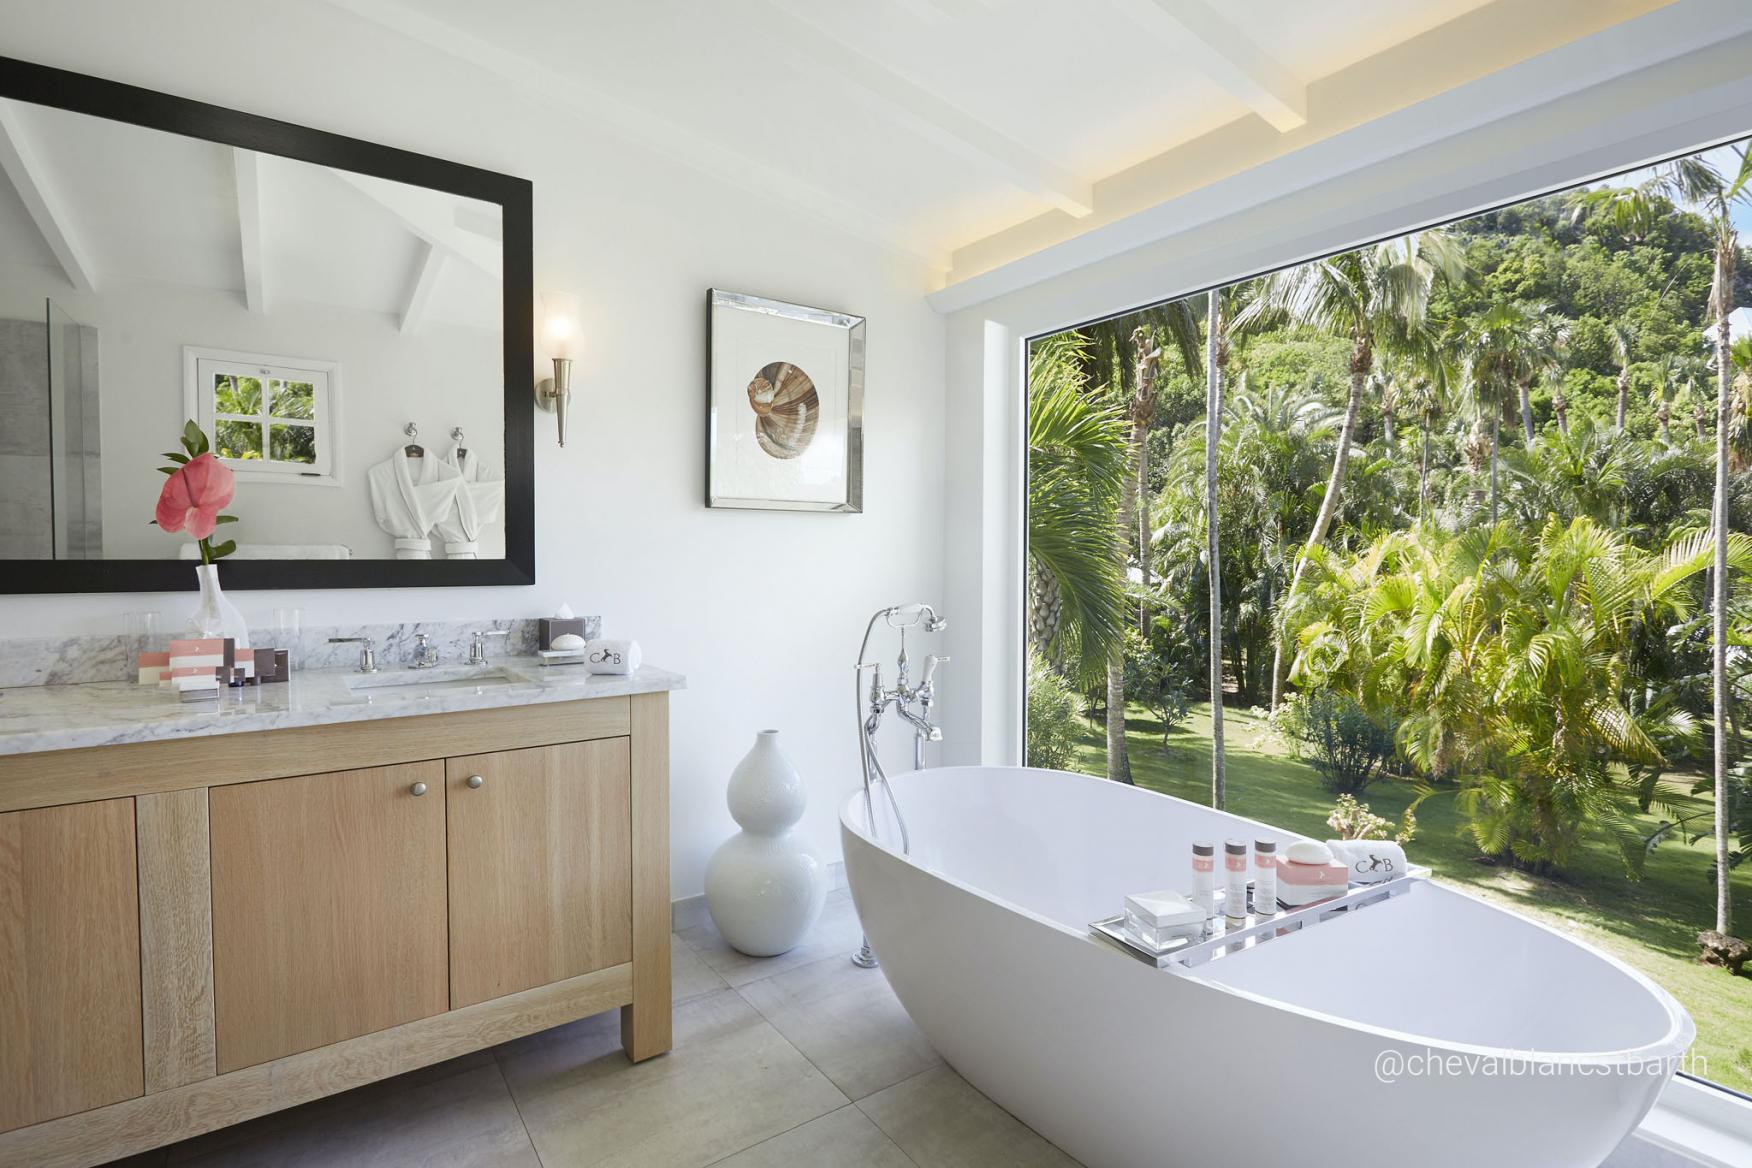 cheval-blanc-st-barth-isle-de-france-garden-bungalow-bathroom_p-carreau-3